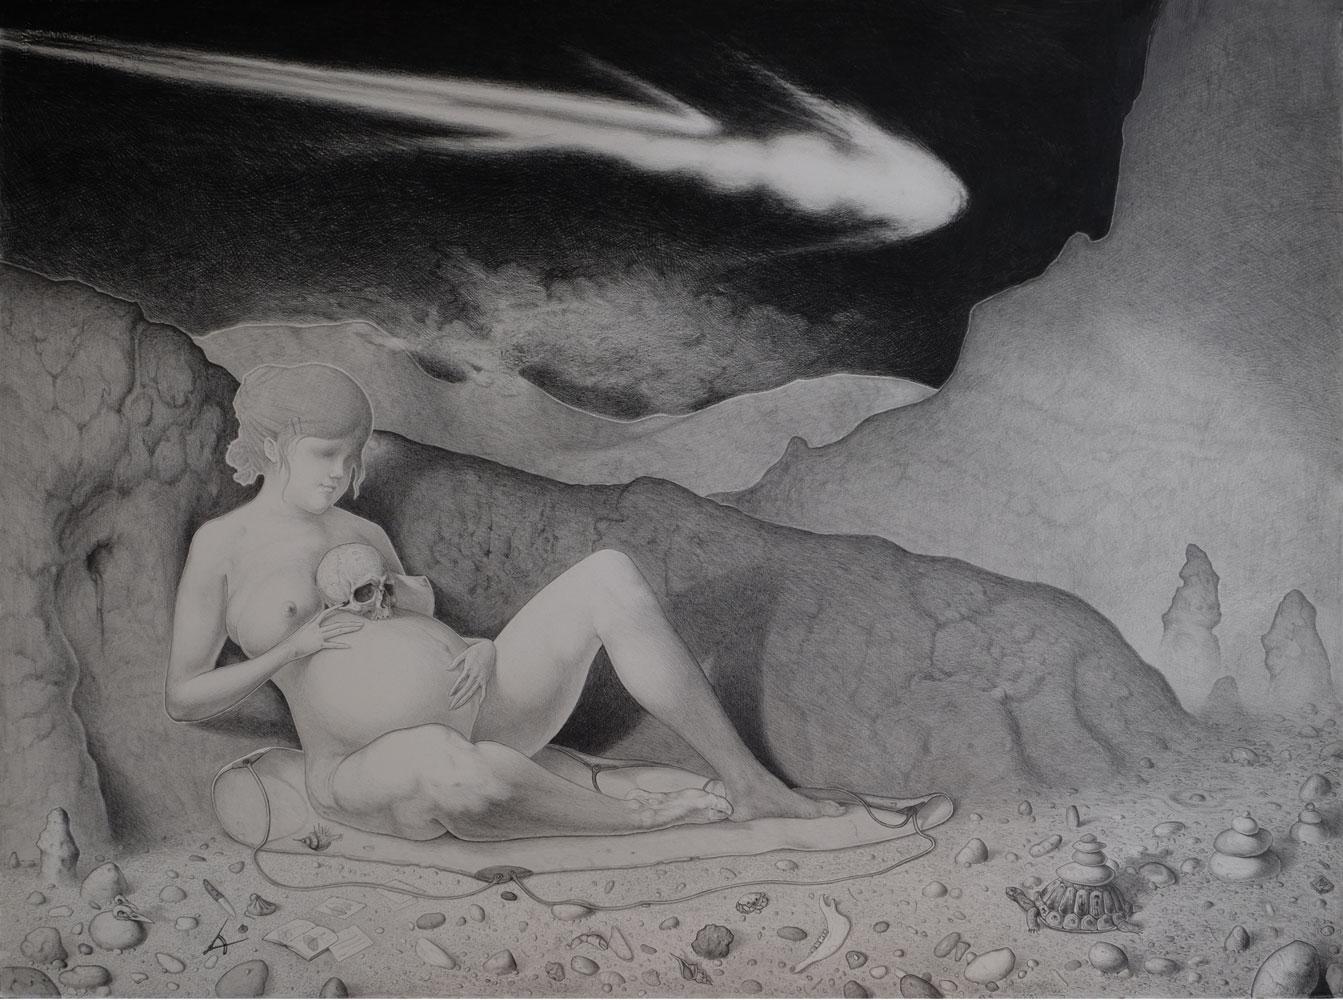 """Iridium"" - Bleistift auf Büttenpapier, 77 cm x 58 cm, 2016"